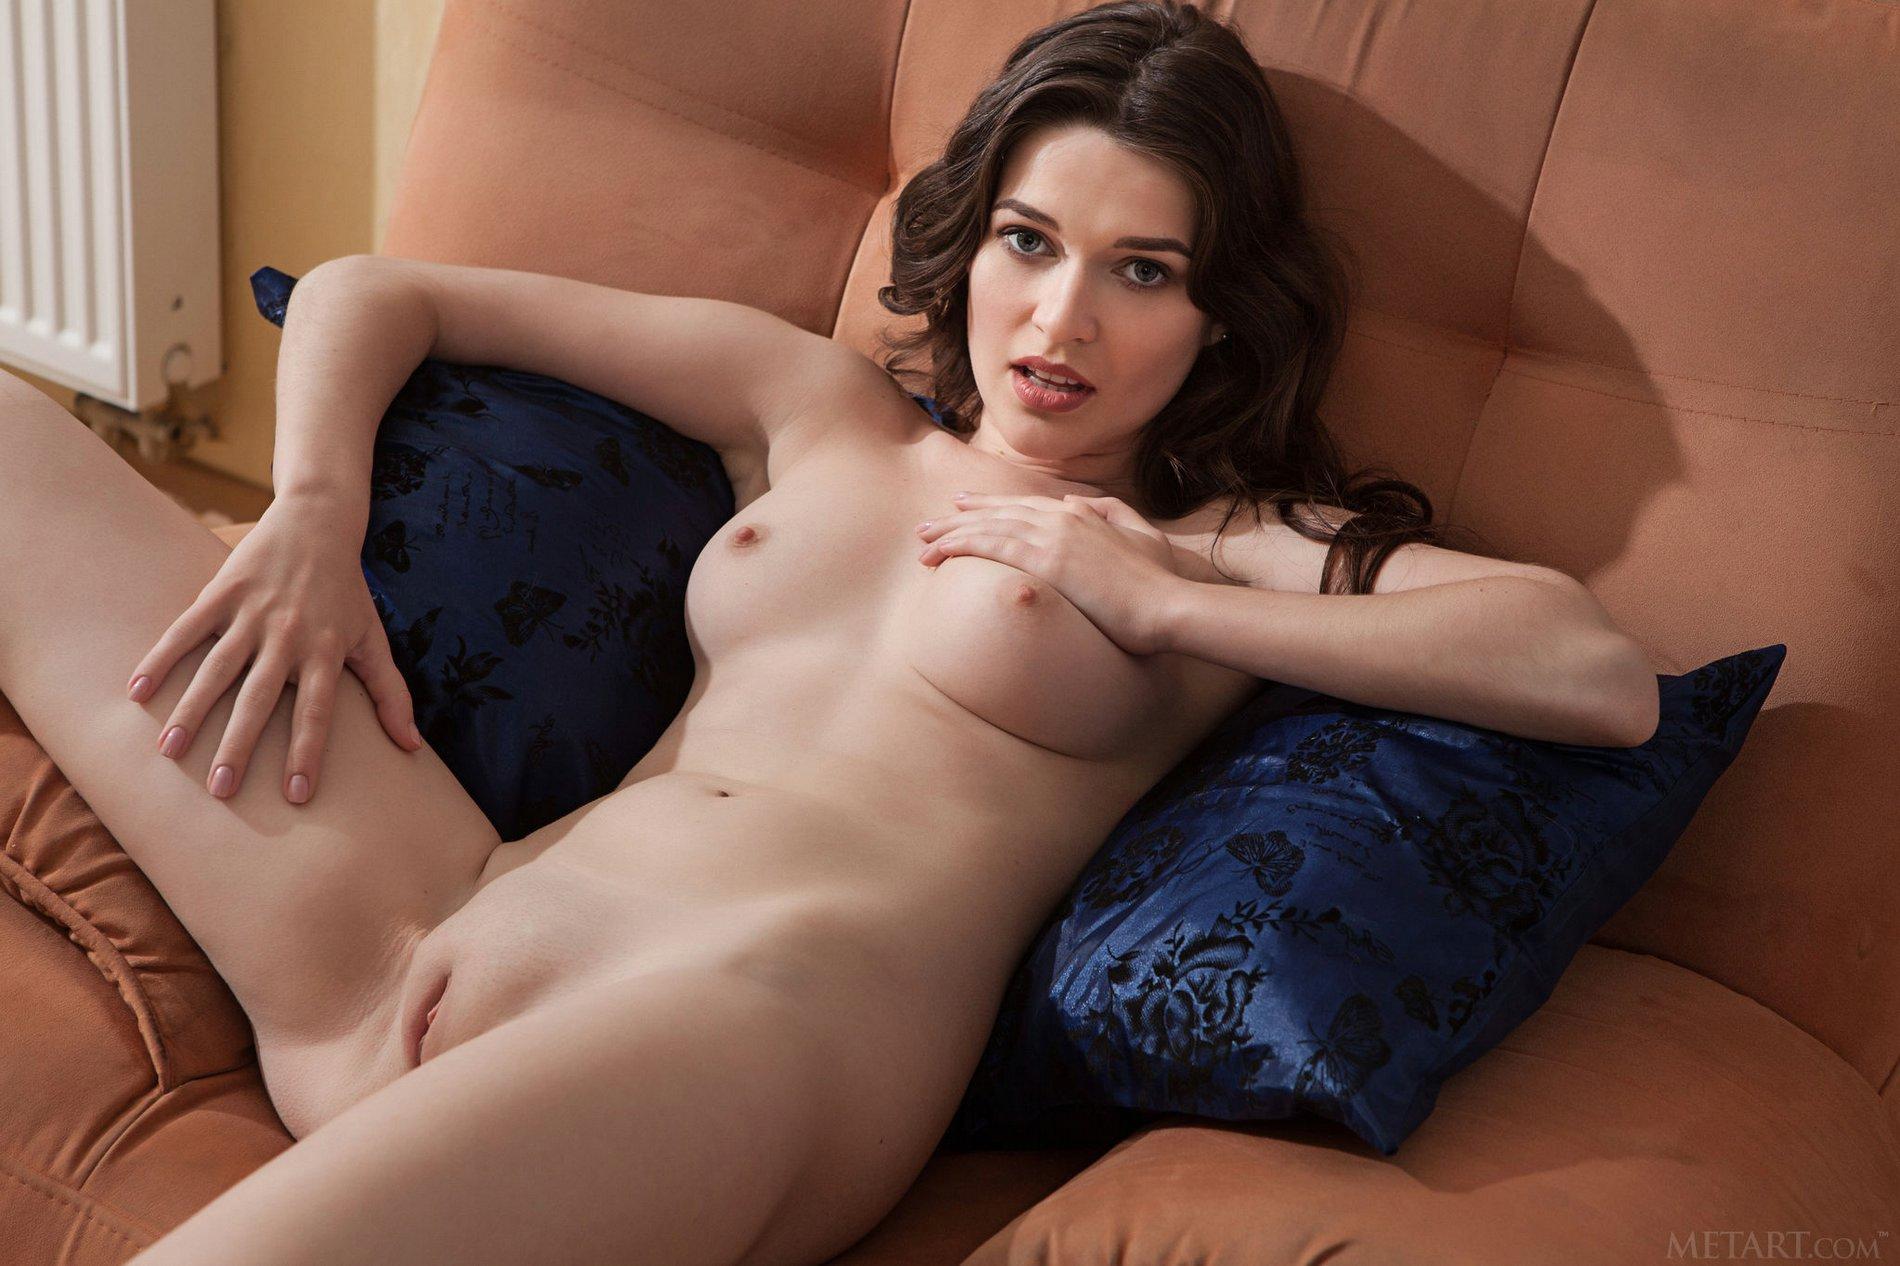 Serena wood nude all